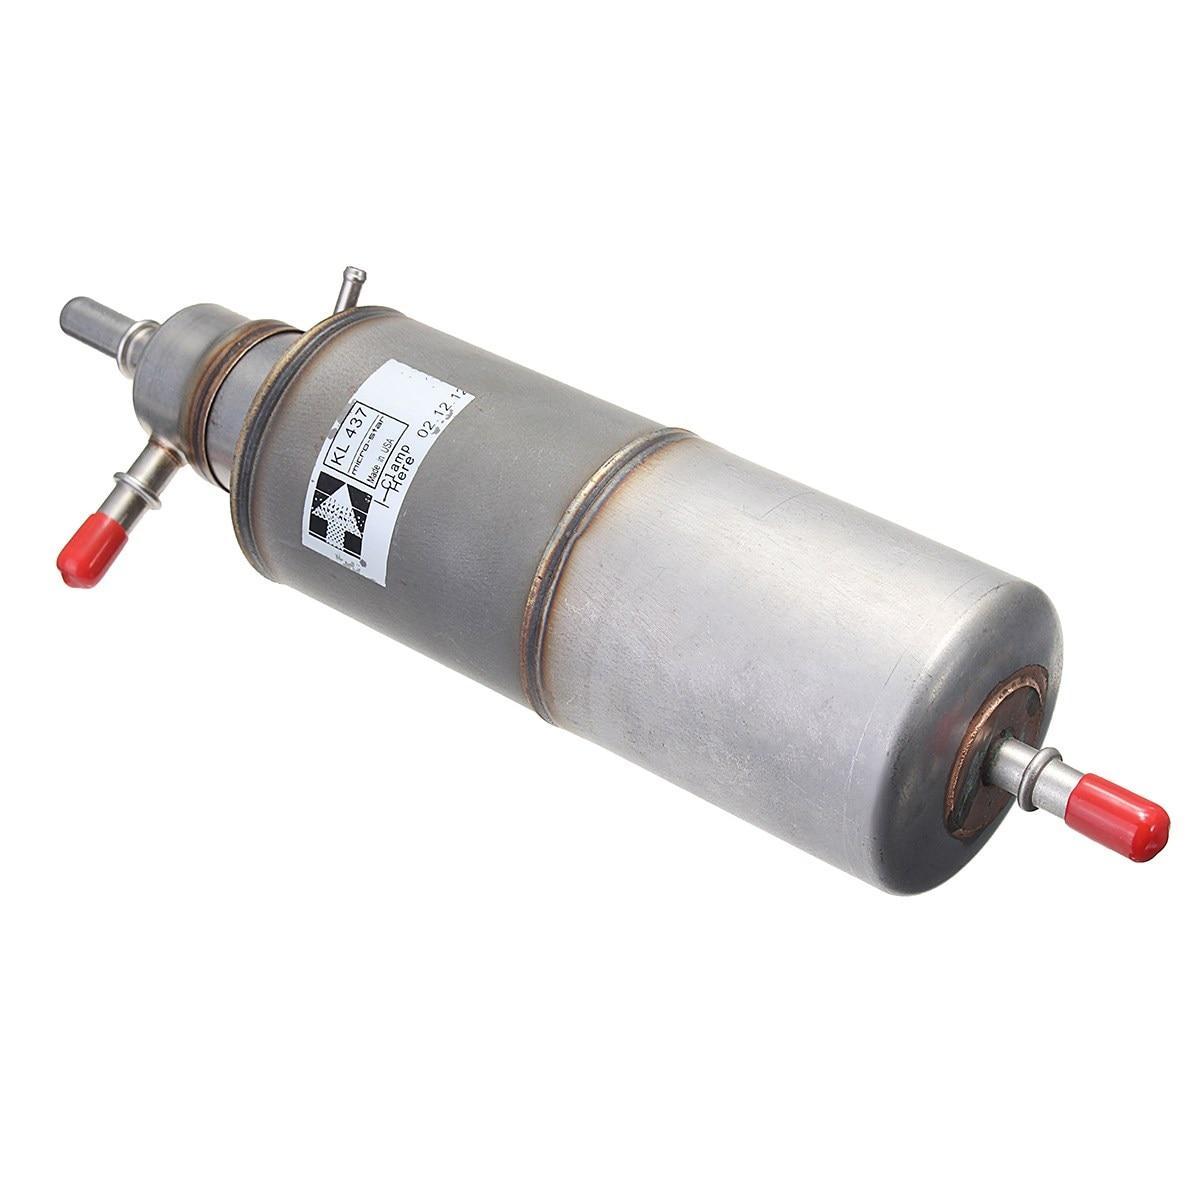 hight resolution of car oil fuel filter pressure regulator for mercedes benz ml55 for amg ml320 ml430 1634770701